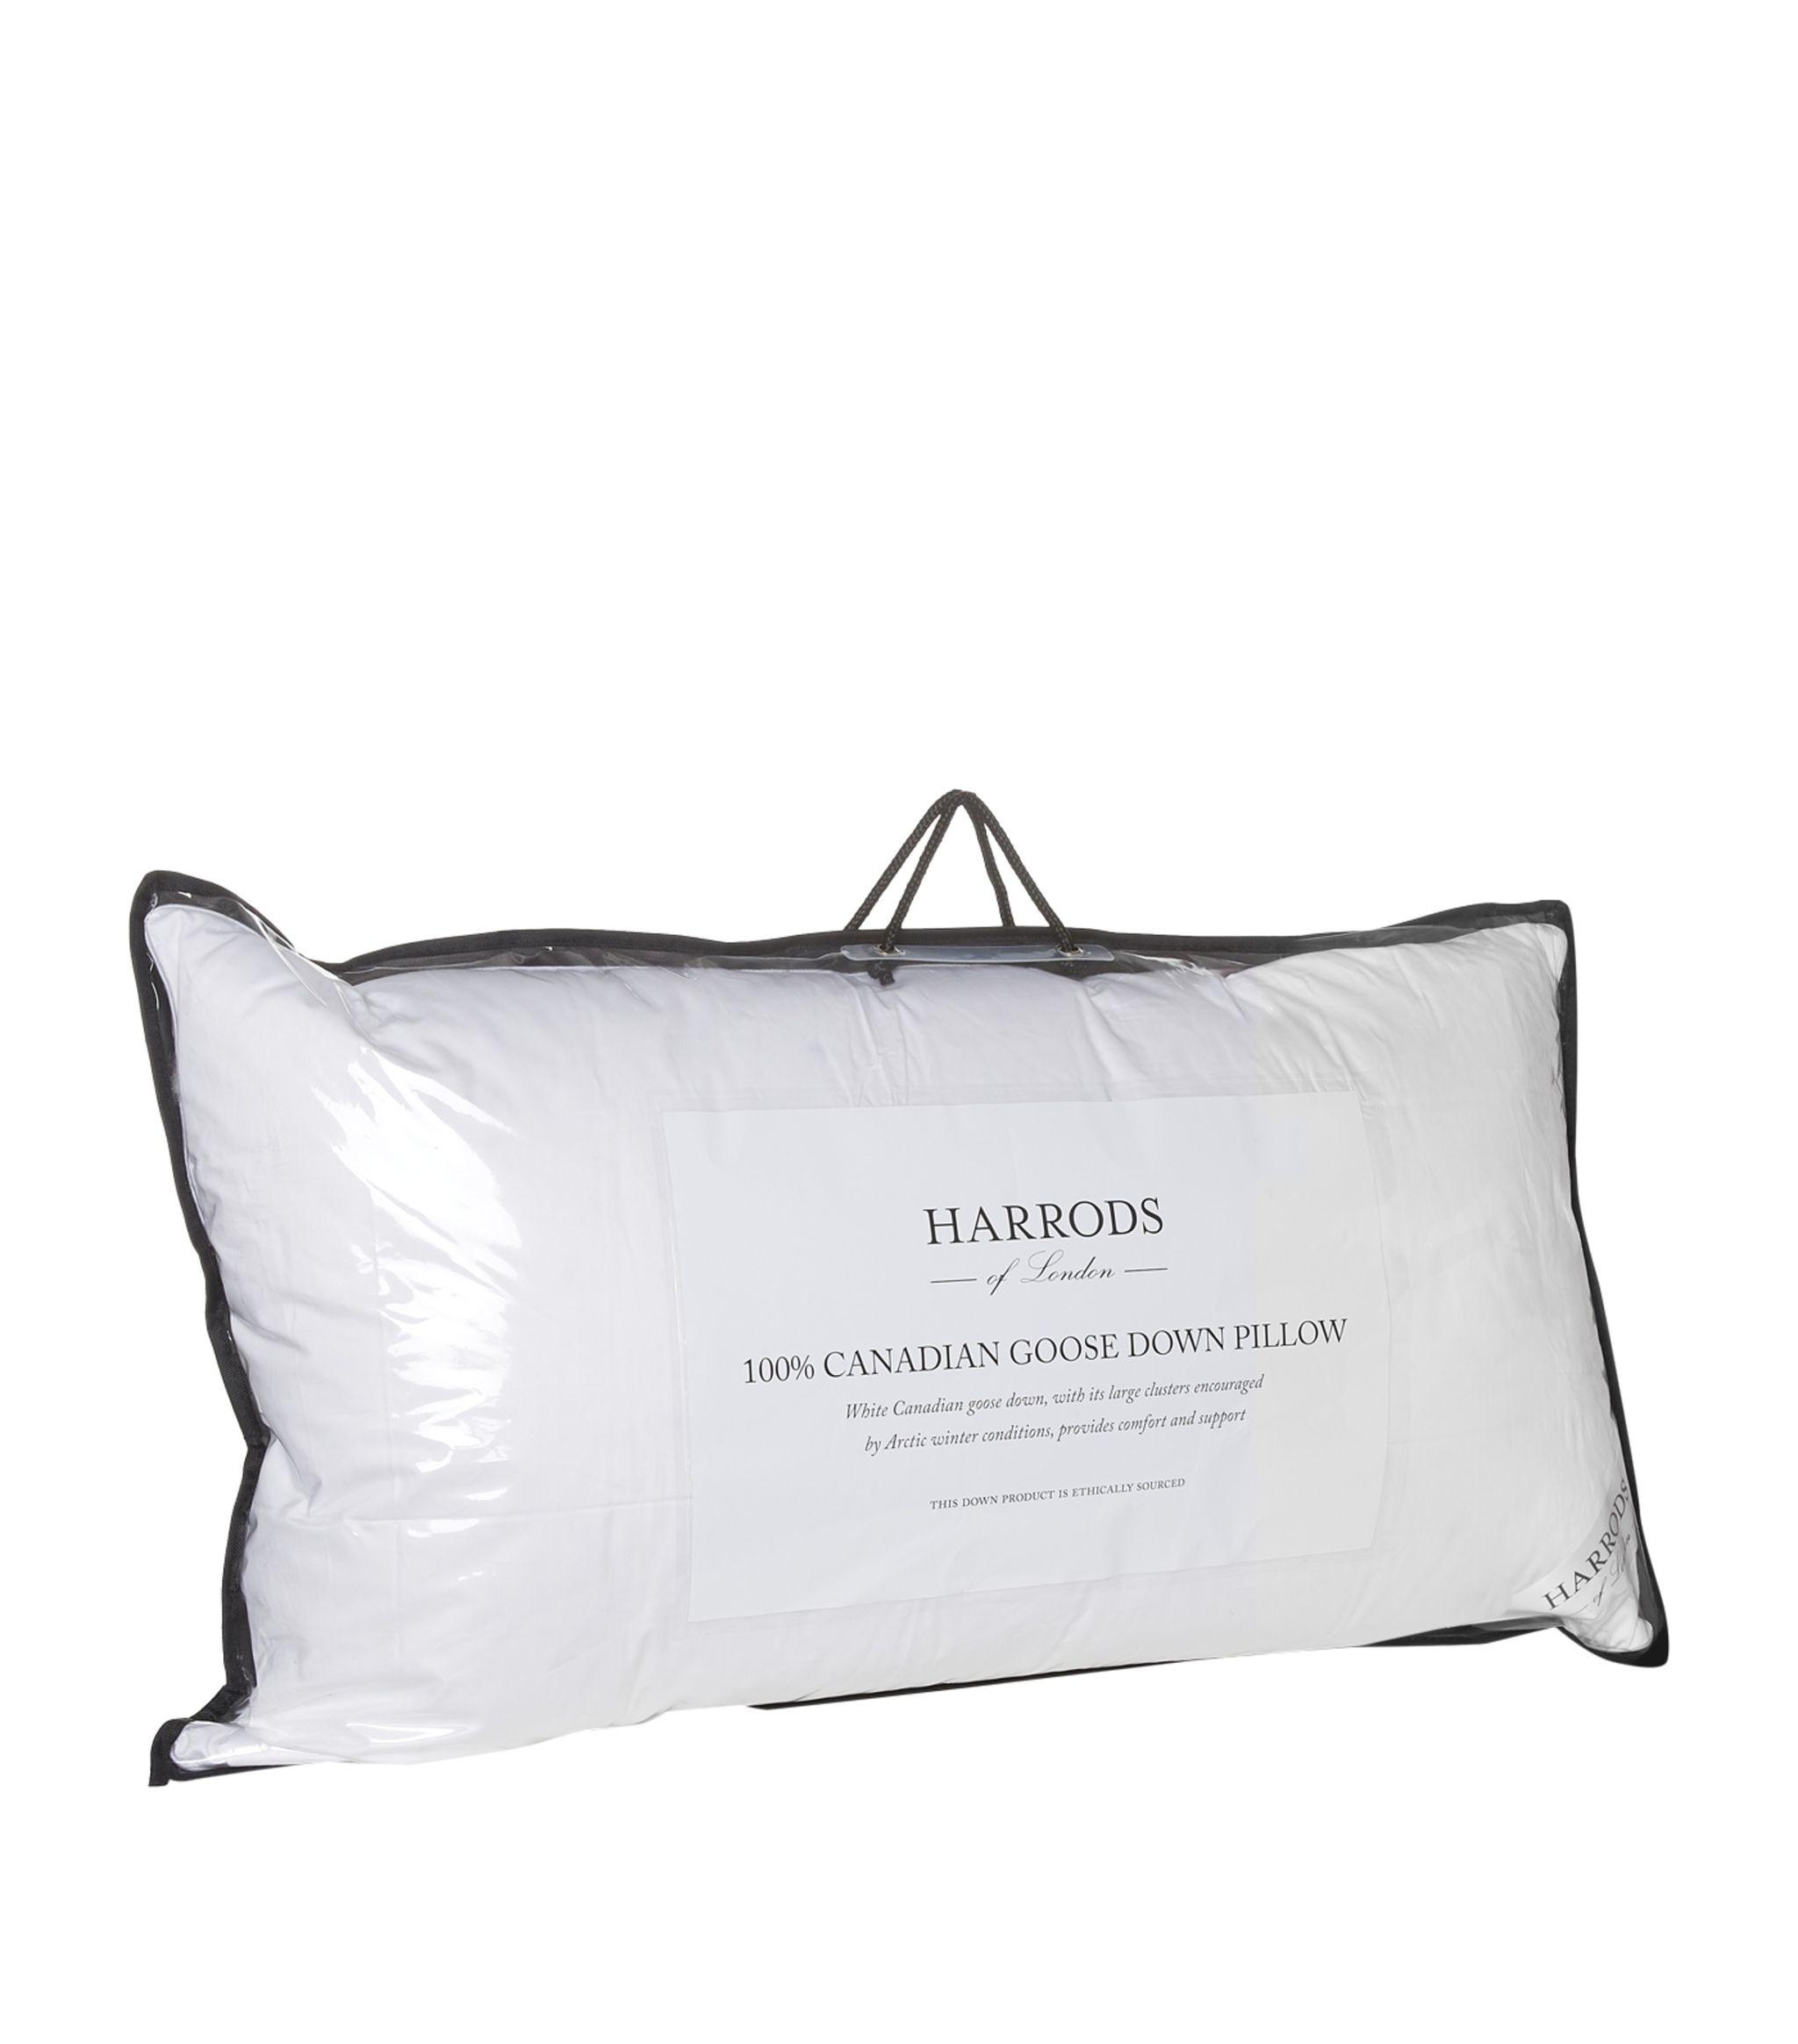 harrods of london 100 canadian goose down pillow 50cm x 90cm harrods us